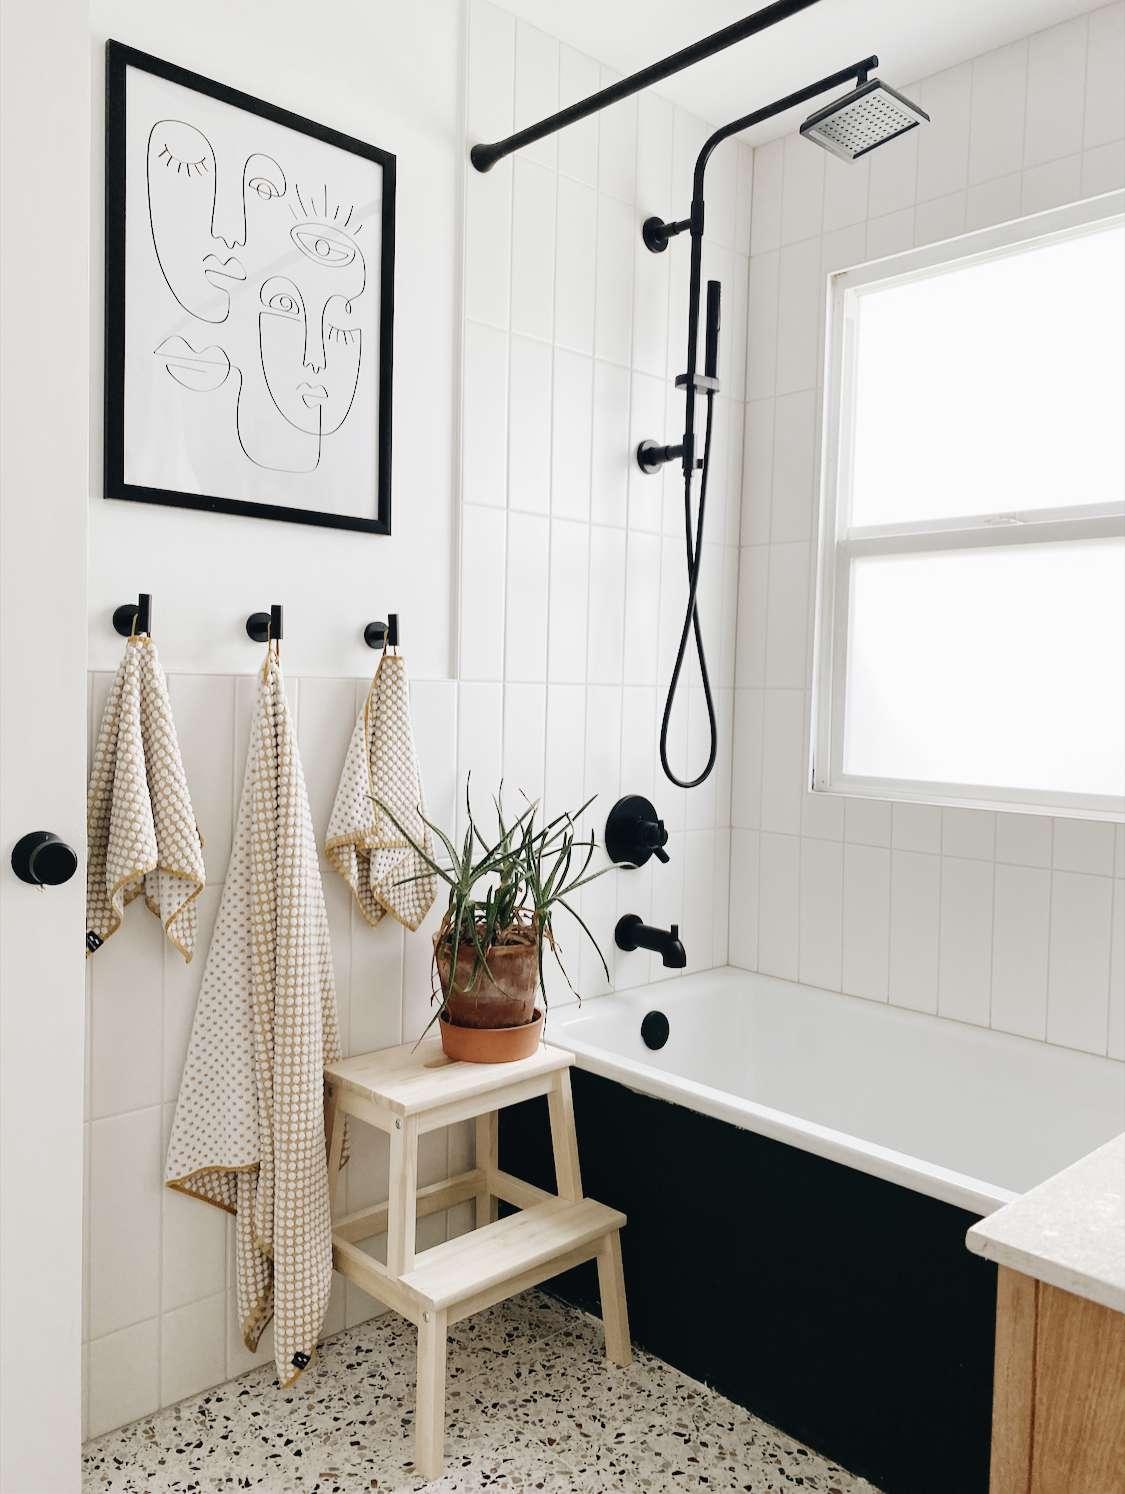 bathroom with terrazzo floor, black fixtures and a plant